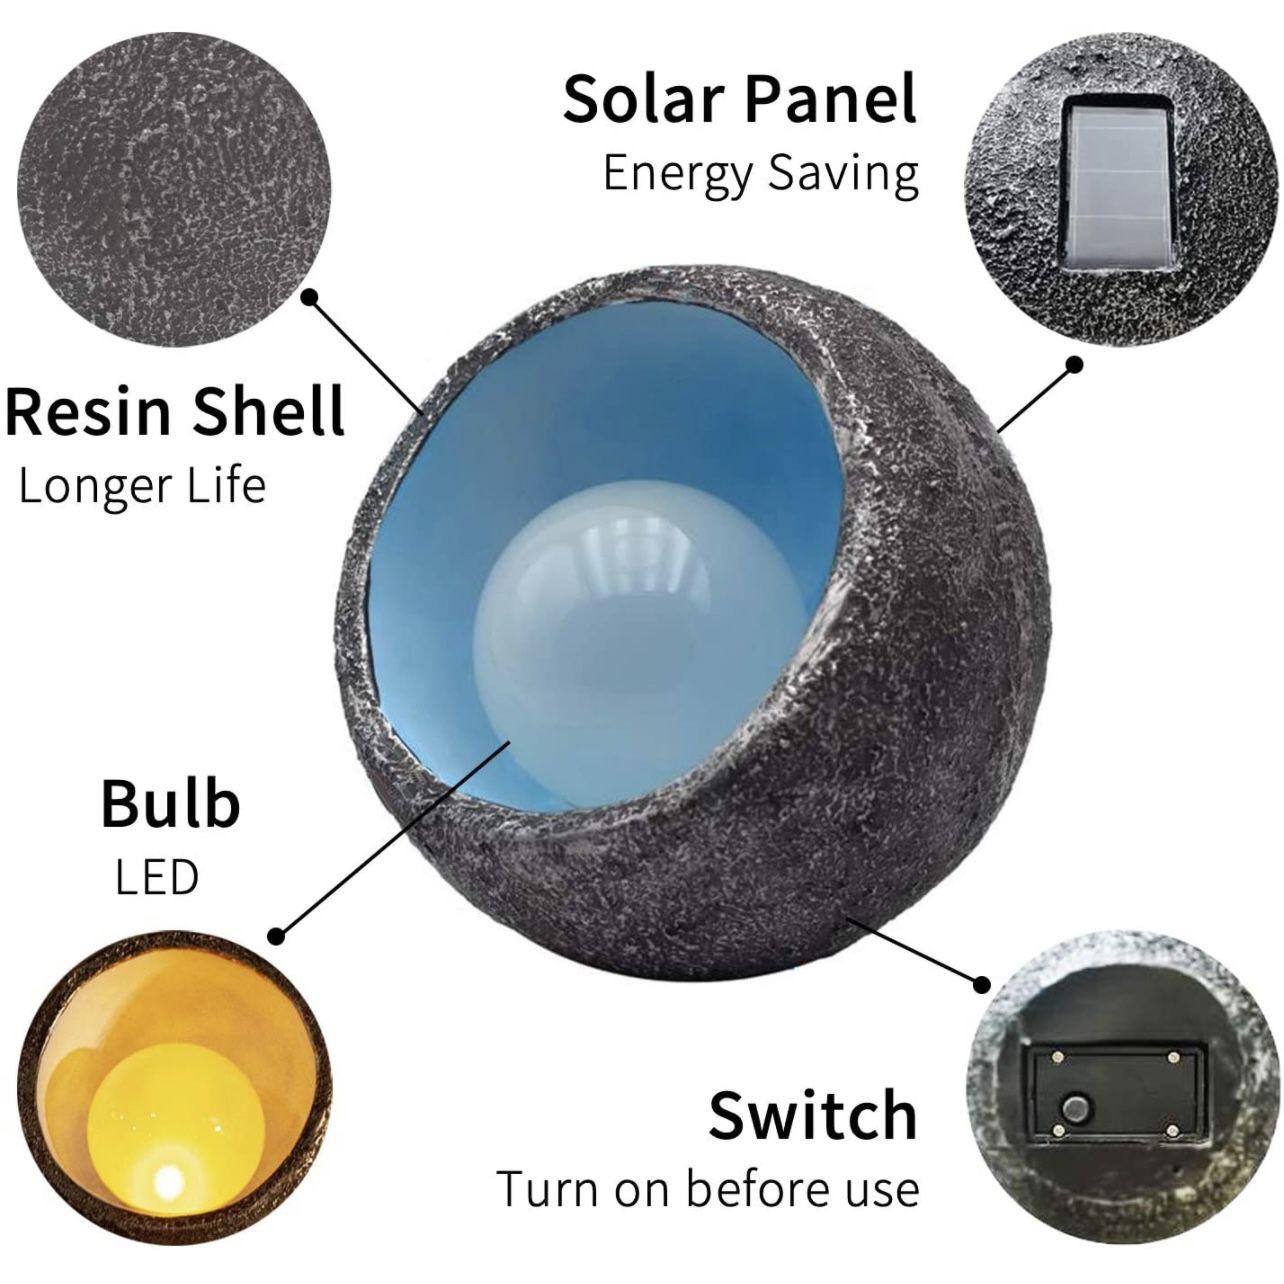 Solar Lights Outdoor Decorative, Resin Dinosaur Egg Solar Powered Outdoor Lights Decor, Waterproof Amber LED Landscape Lighting for Garden Patio Porch